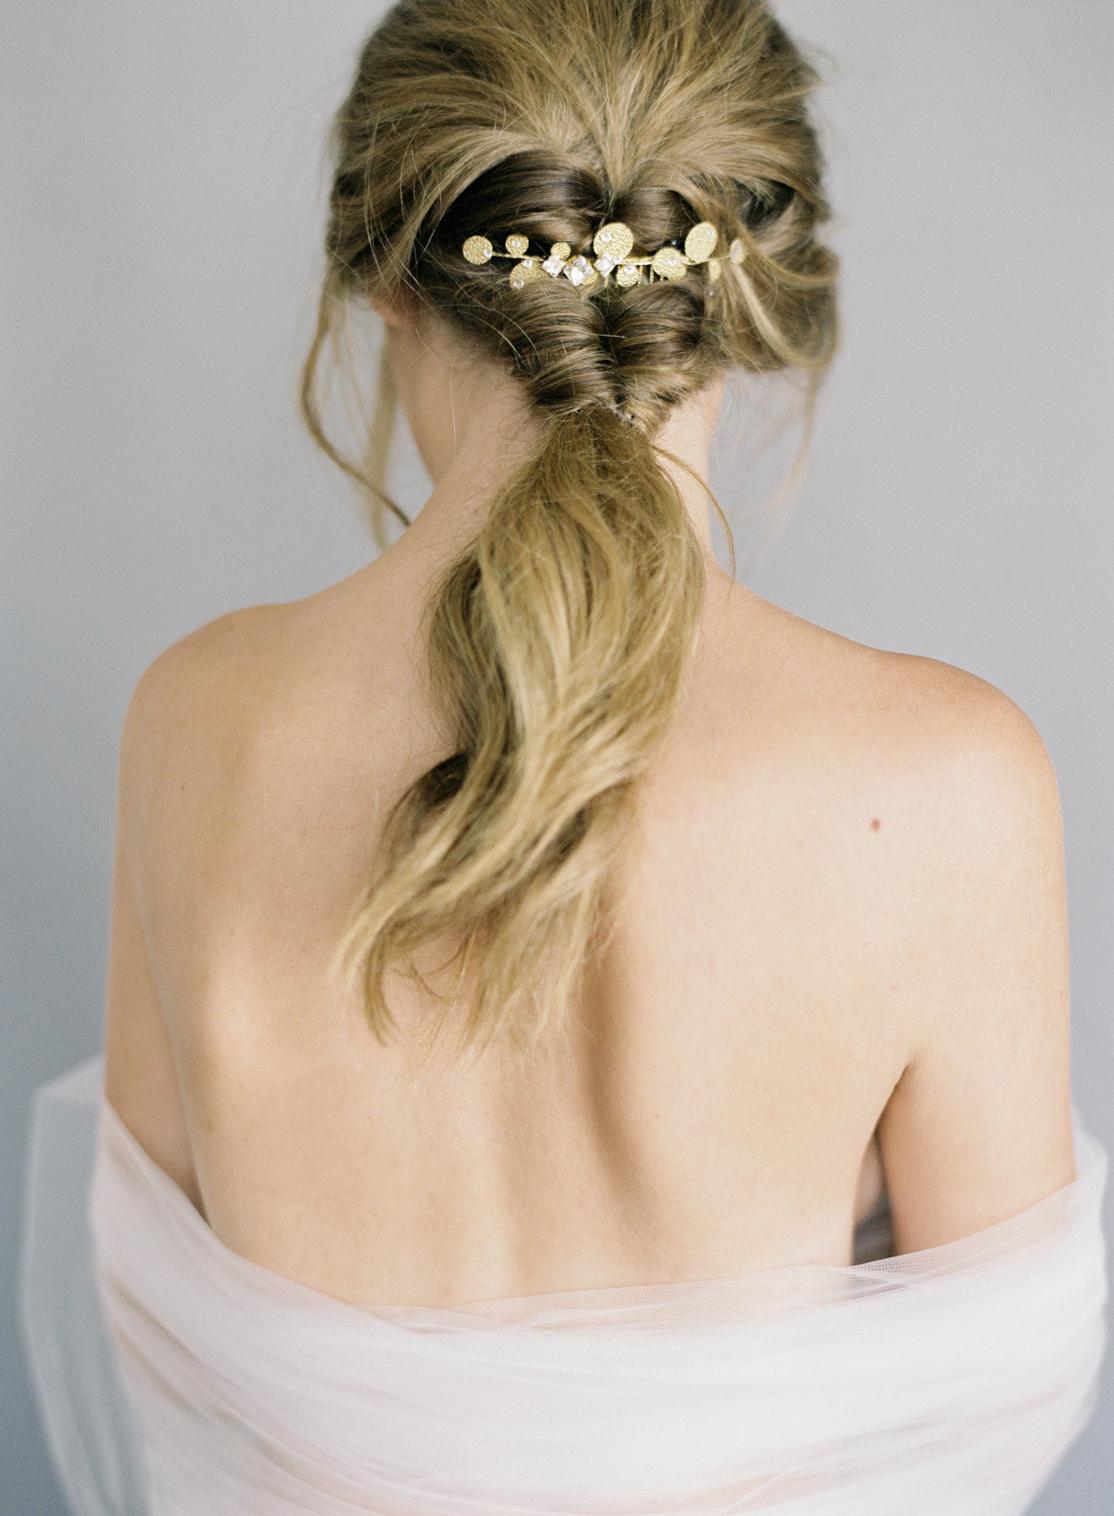 Hushed Commotion, Jen Huang 2017, Carson, modern gold comb, ponytail.jpg